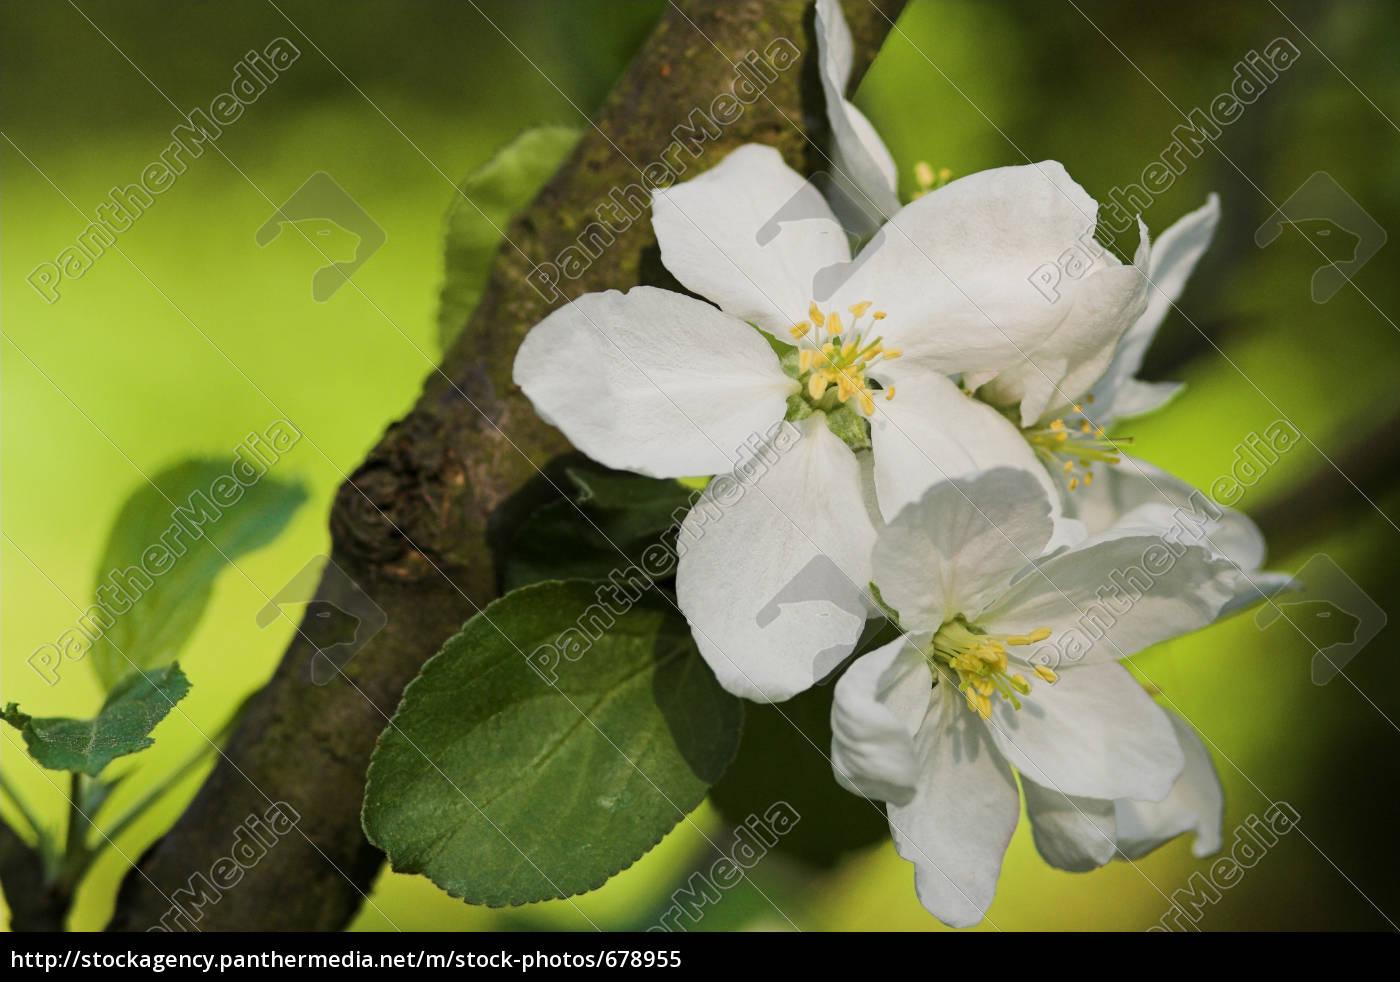 apple, blossom - 678955